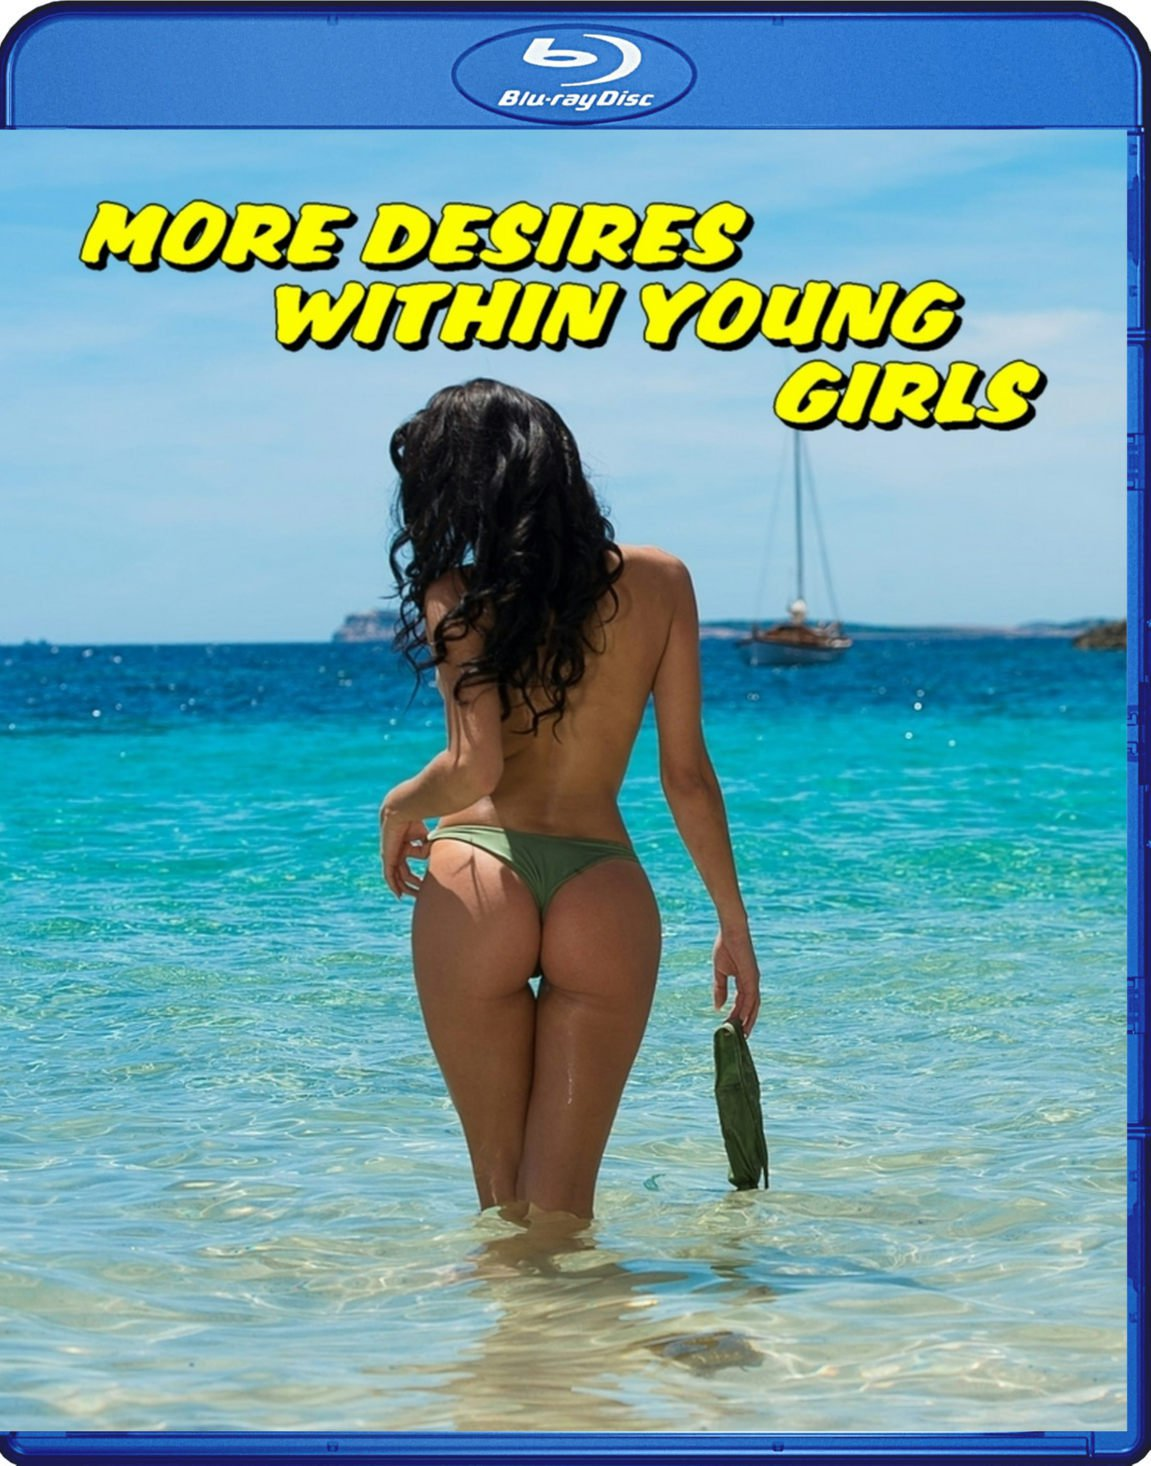 More Desires Within Young Girls Blu-Ray (6 Schwedinnen Auf Ibiza) Erotic